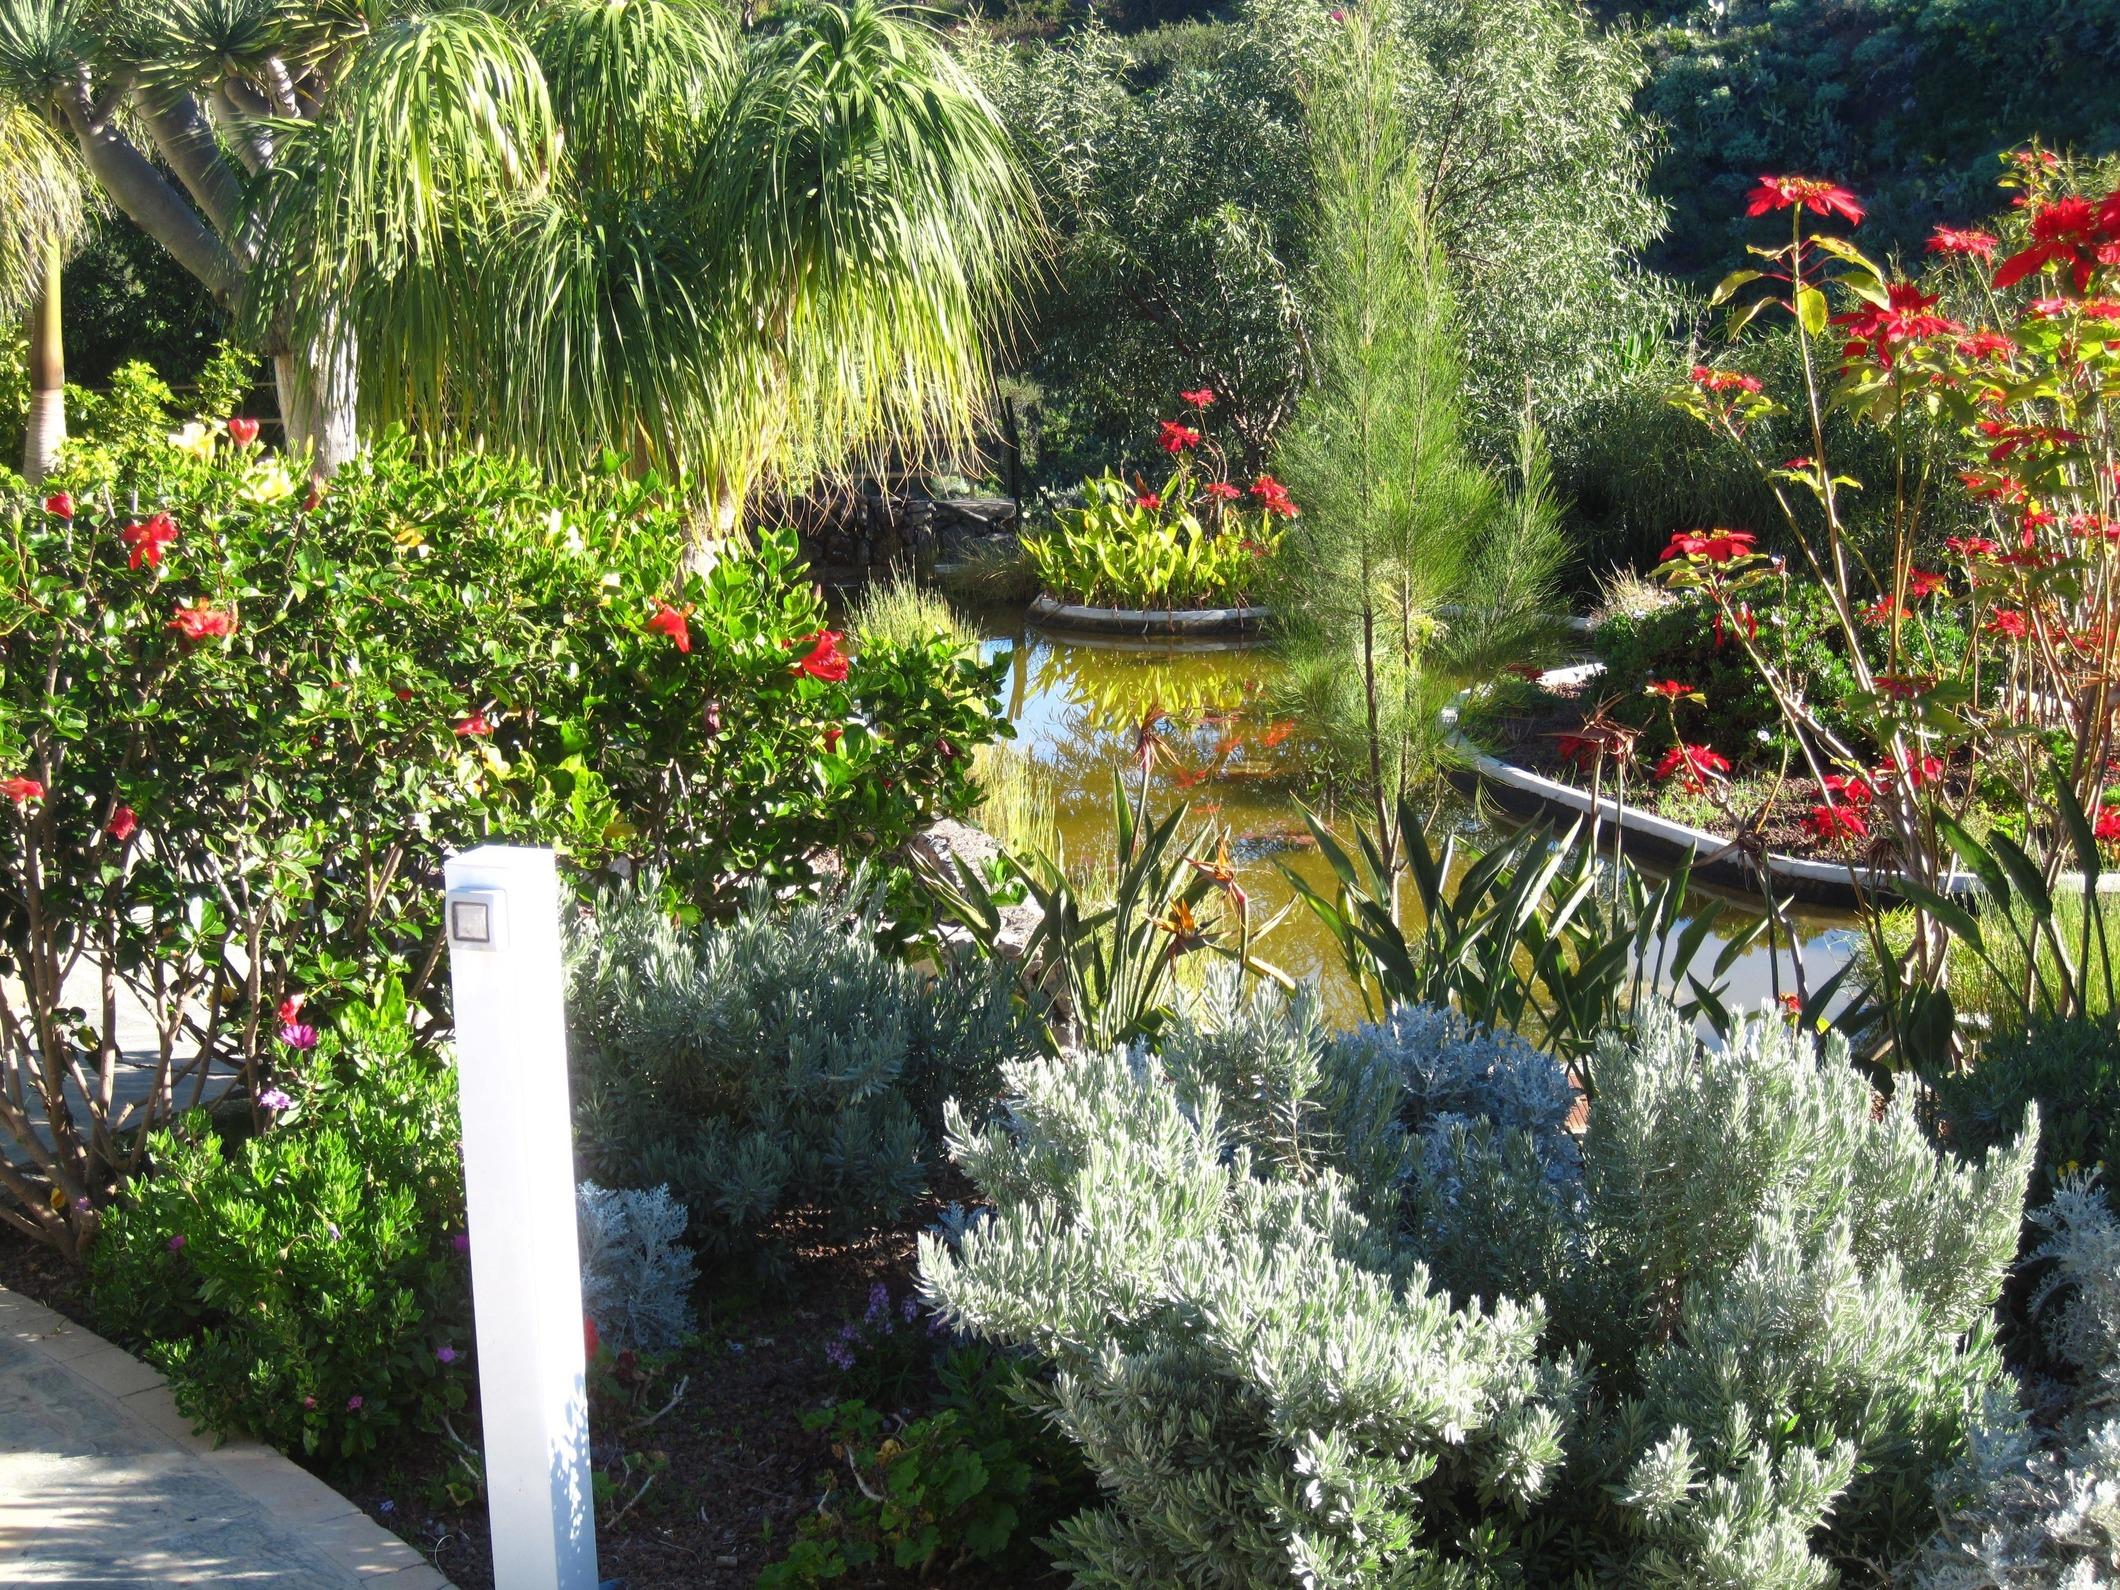 Appartement de vacances Fewo Atico Florasol, sehr ruhig direkt am Naturschutzgebiet, mit Pool, 2 Terrassen, Grill, (2492983), Santa Ursula, Ténérife, Iles Canaries, Espagne, image 23